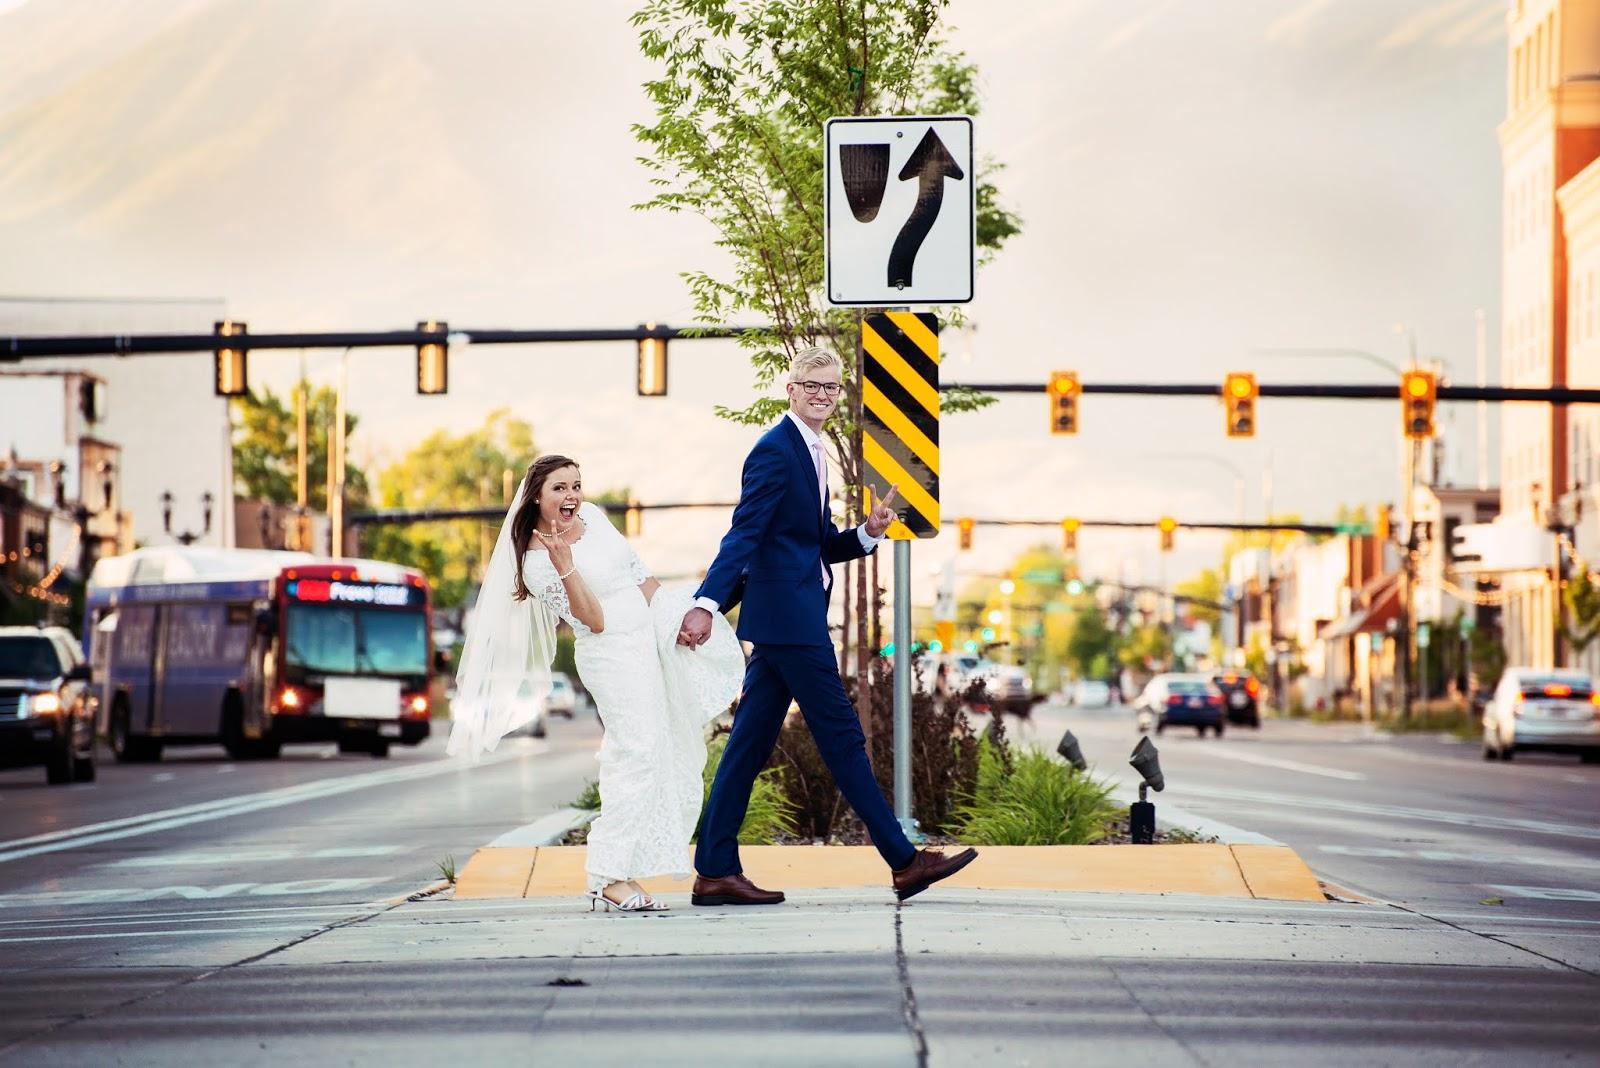 Kaylee & Jacob Wedding-Provo, UT wedding photographer-Julie Dawn Photography